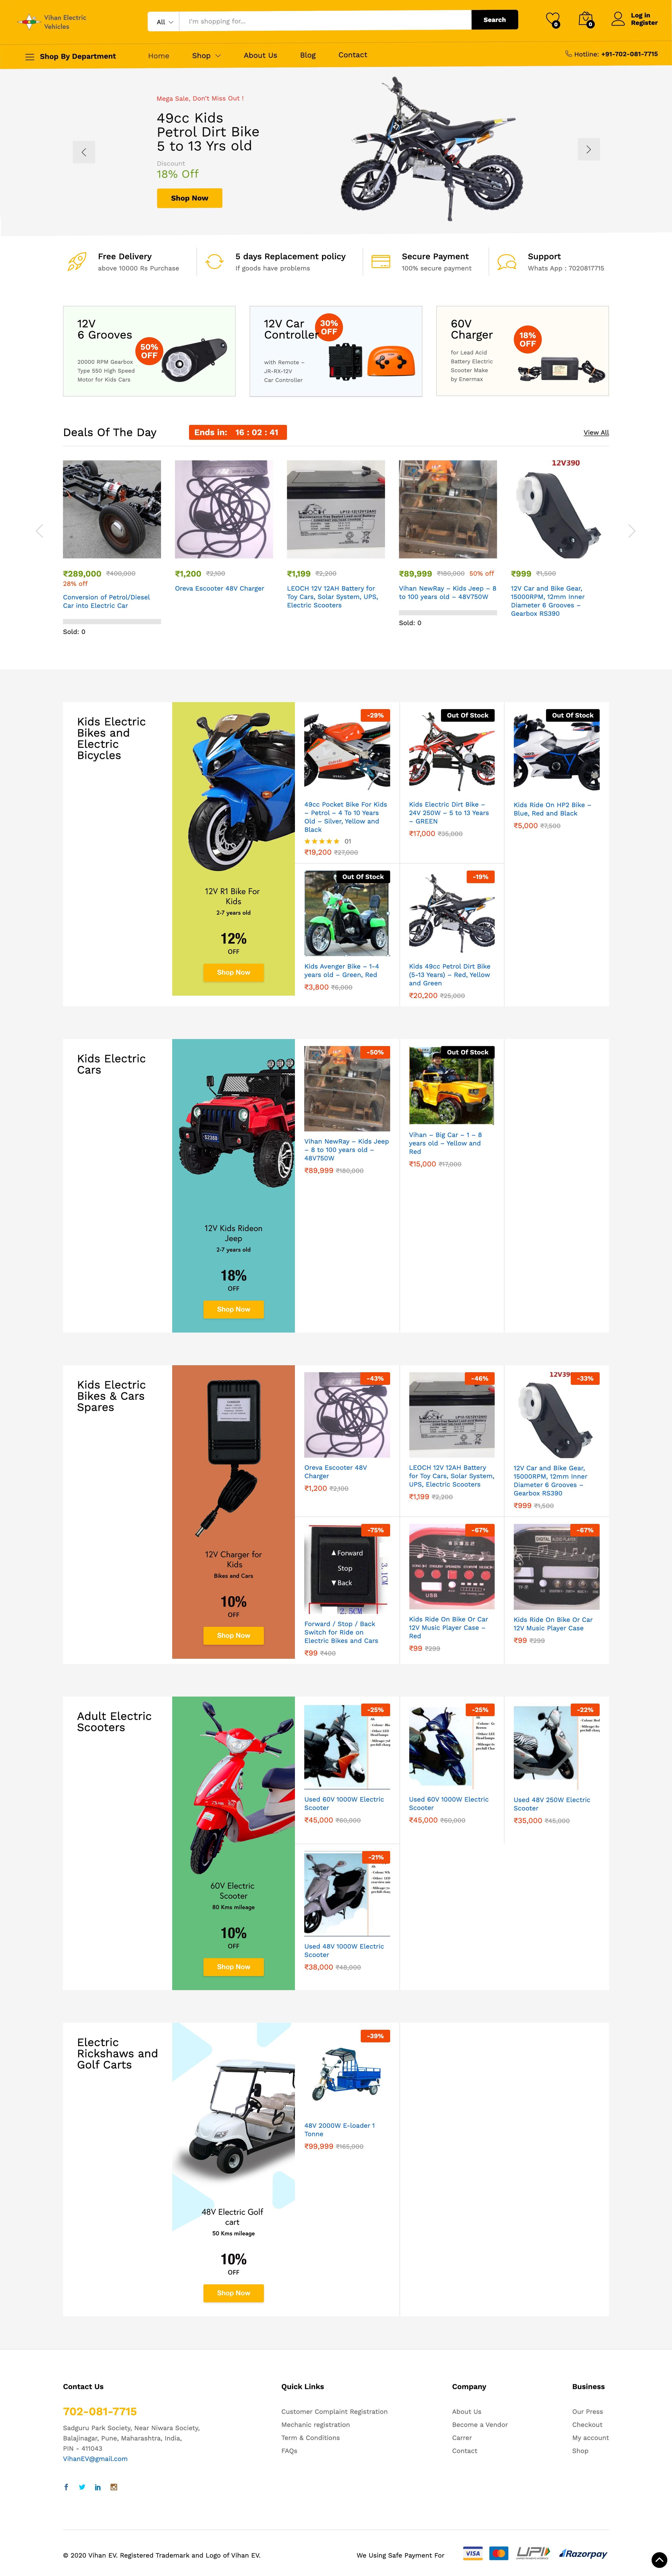 vihanev.com-ecommerce-website-development-pune-india